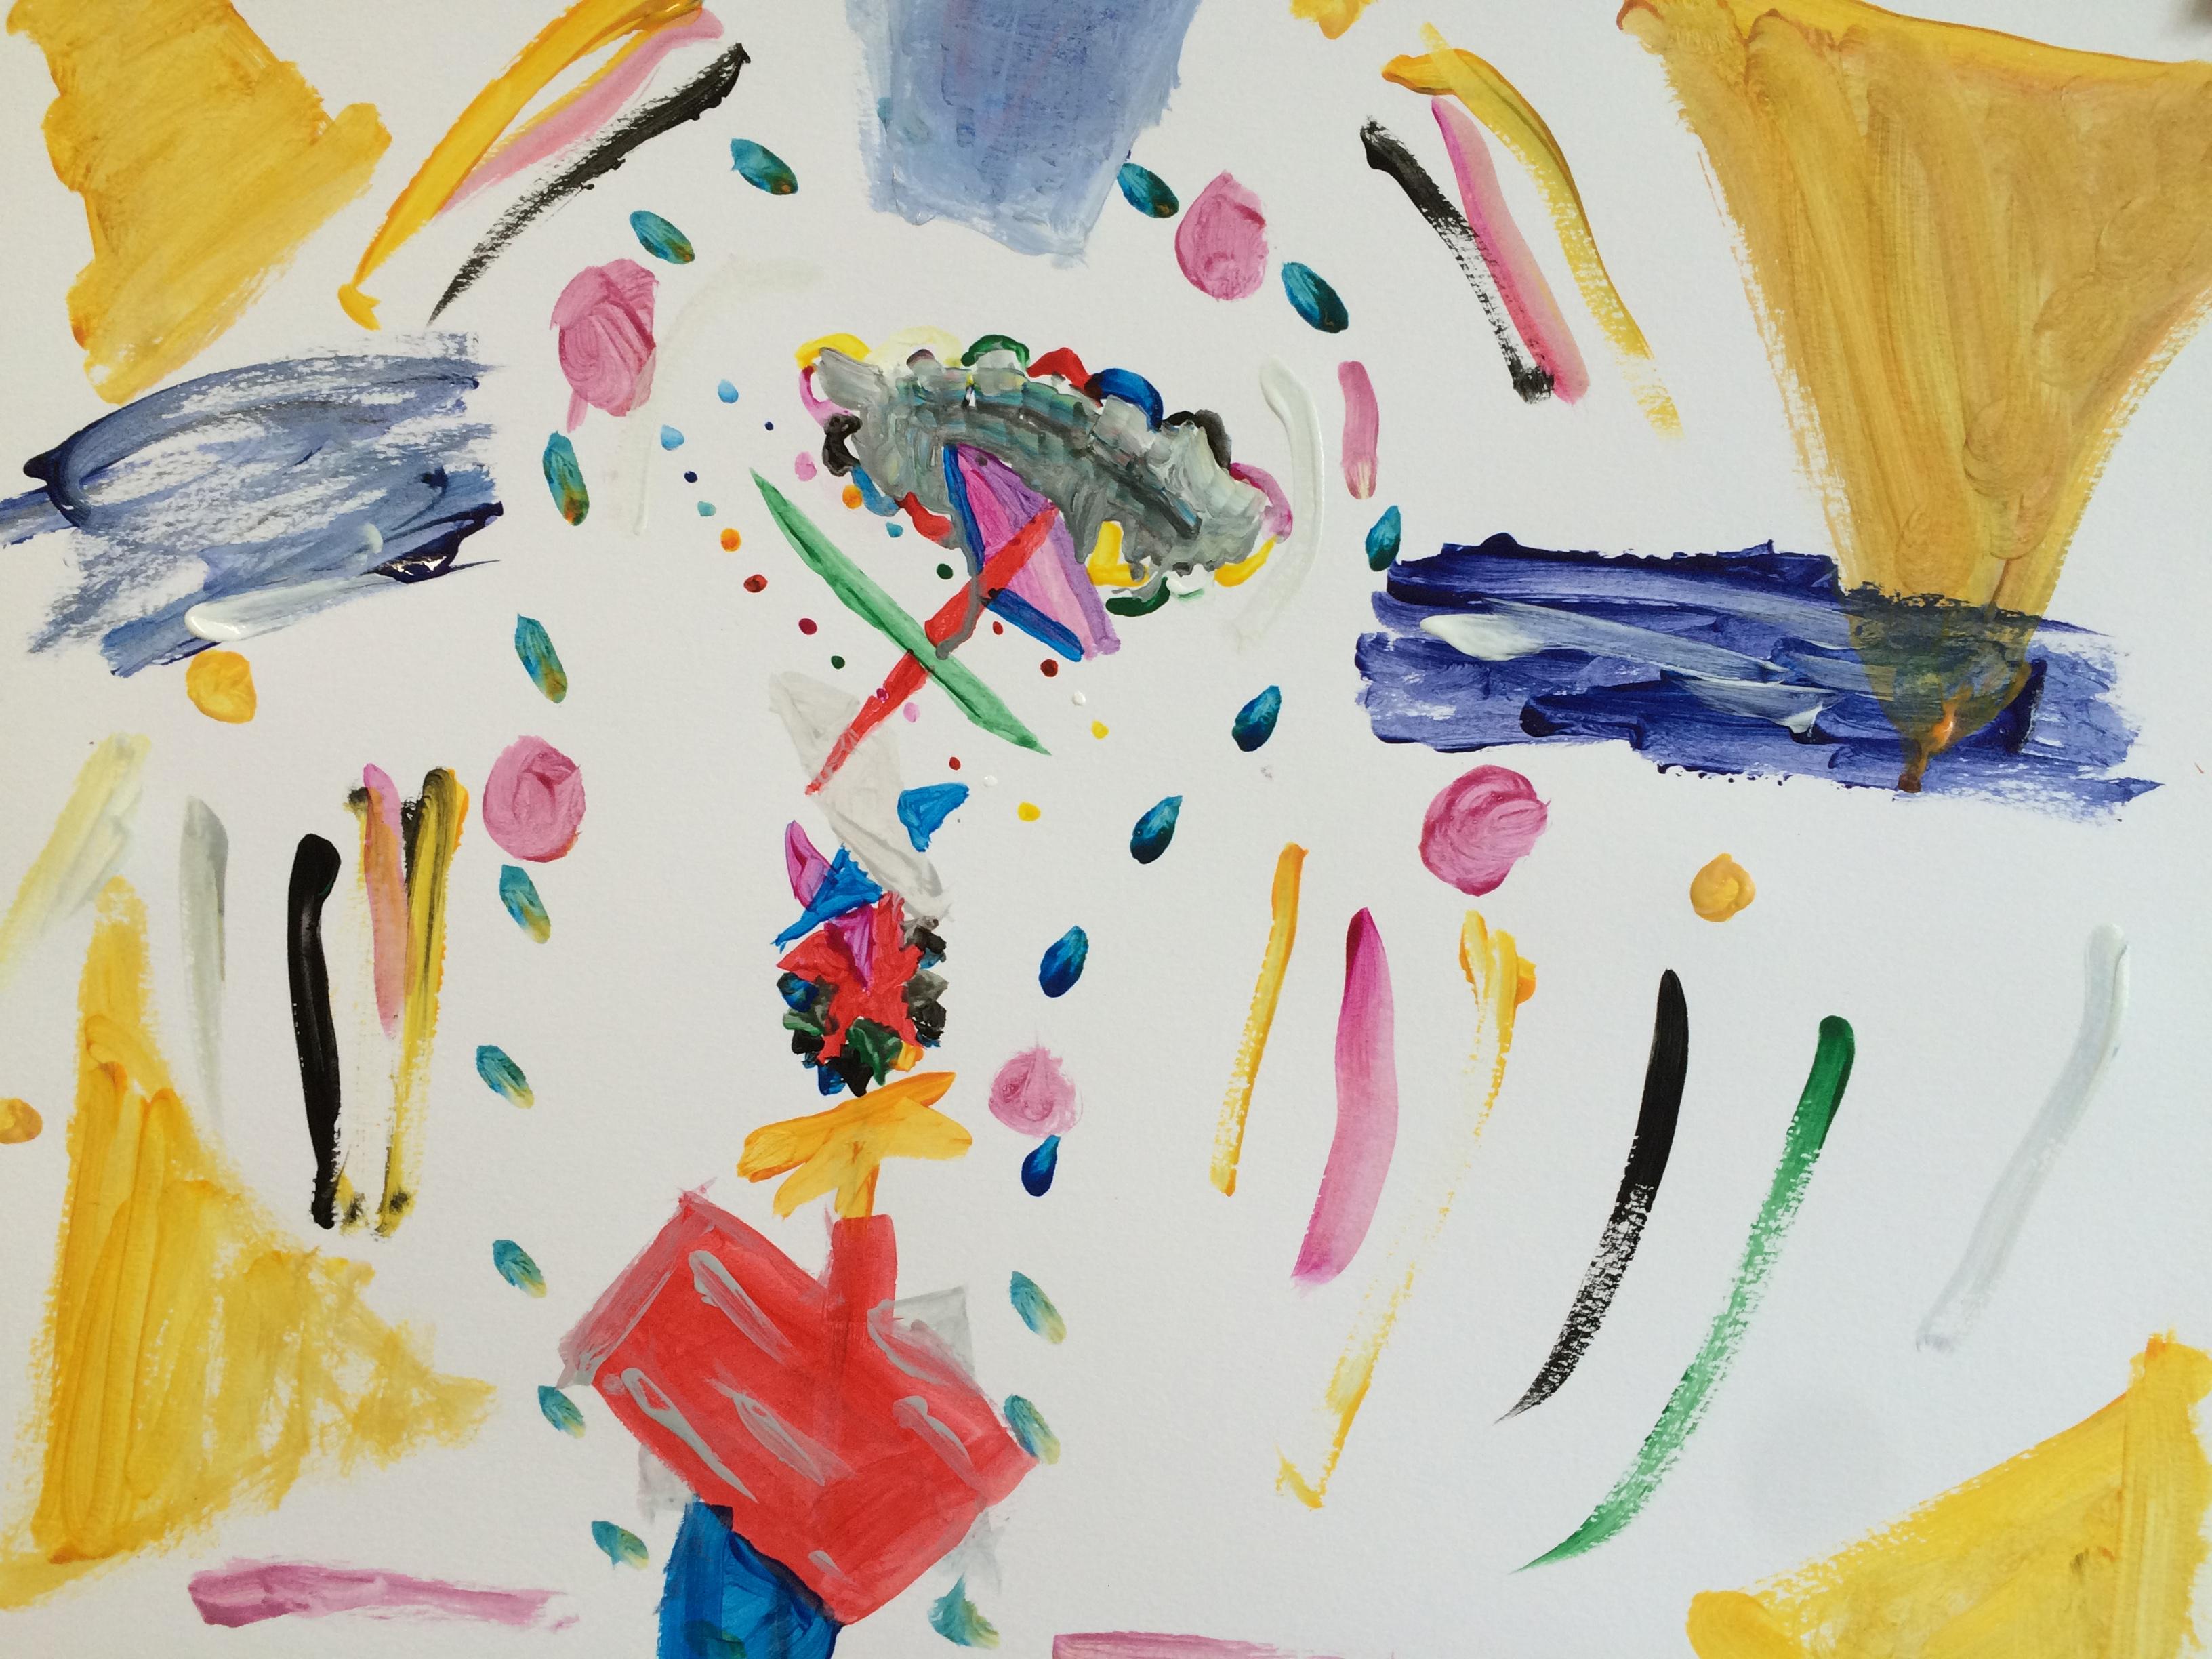 On explore l'univers de Kandinsky